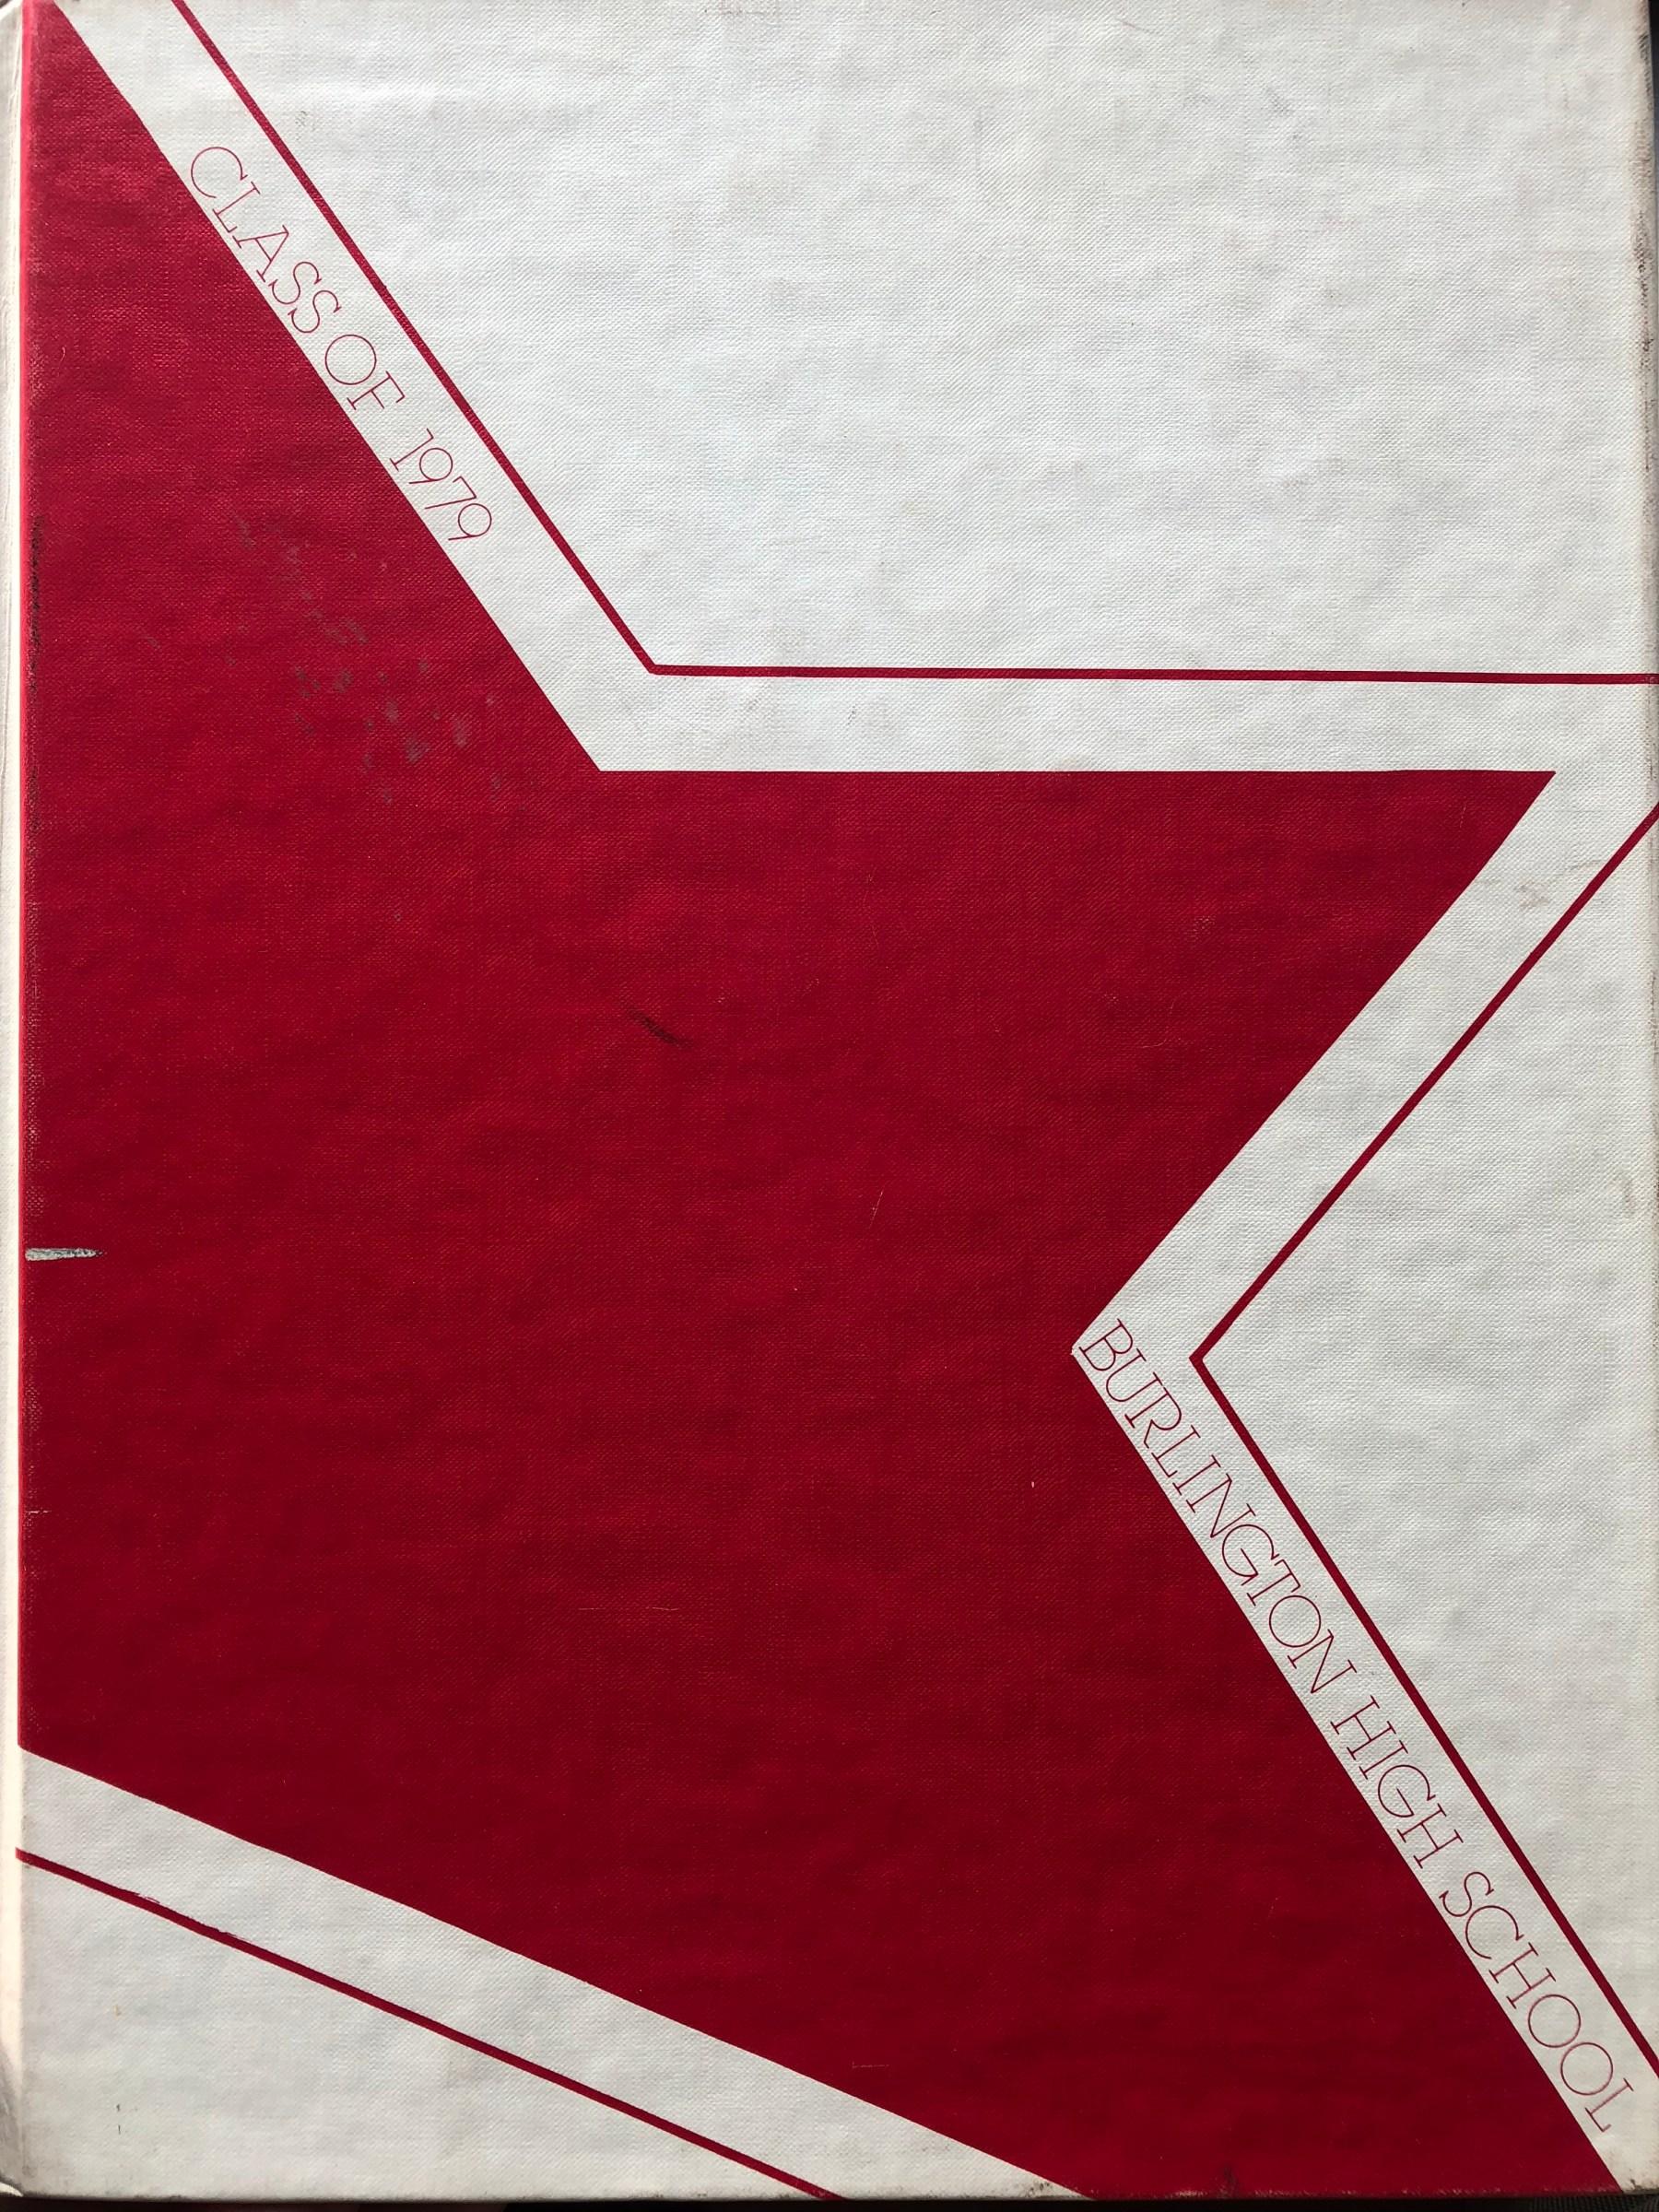 Burlington High School Burlington MA 1979 yearbook